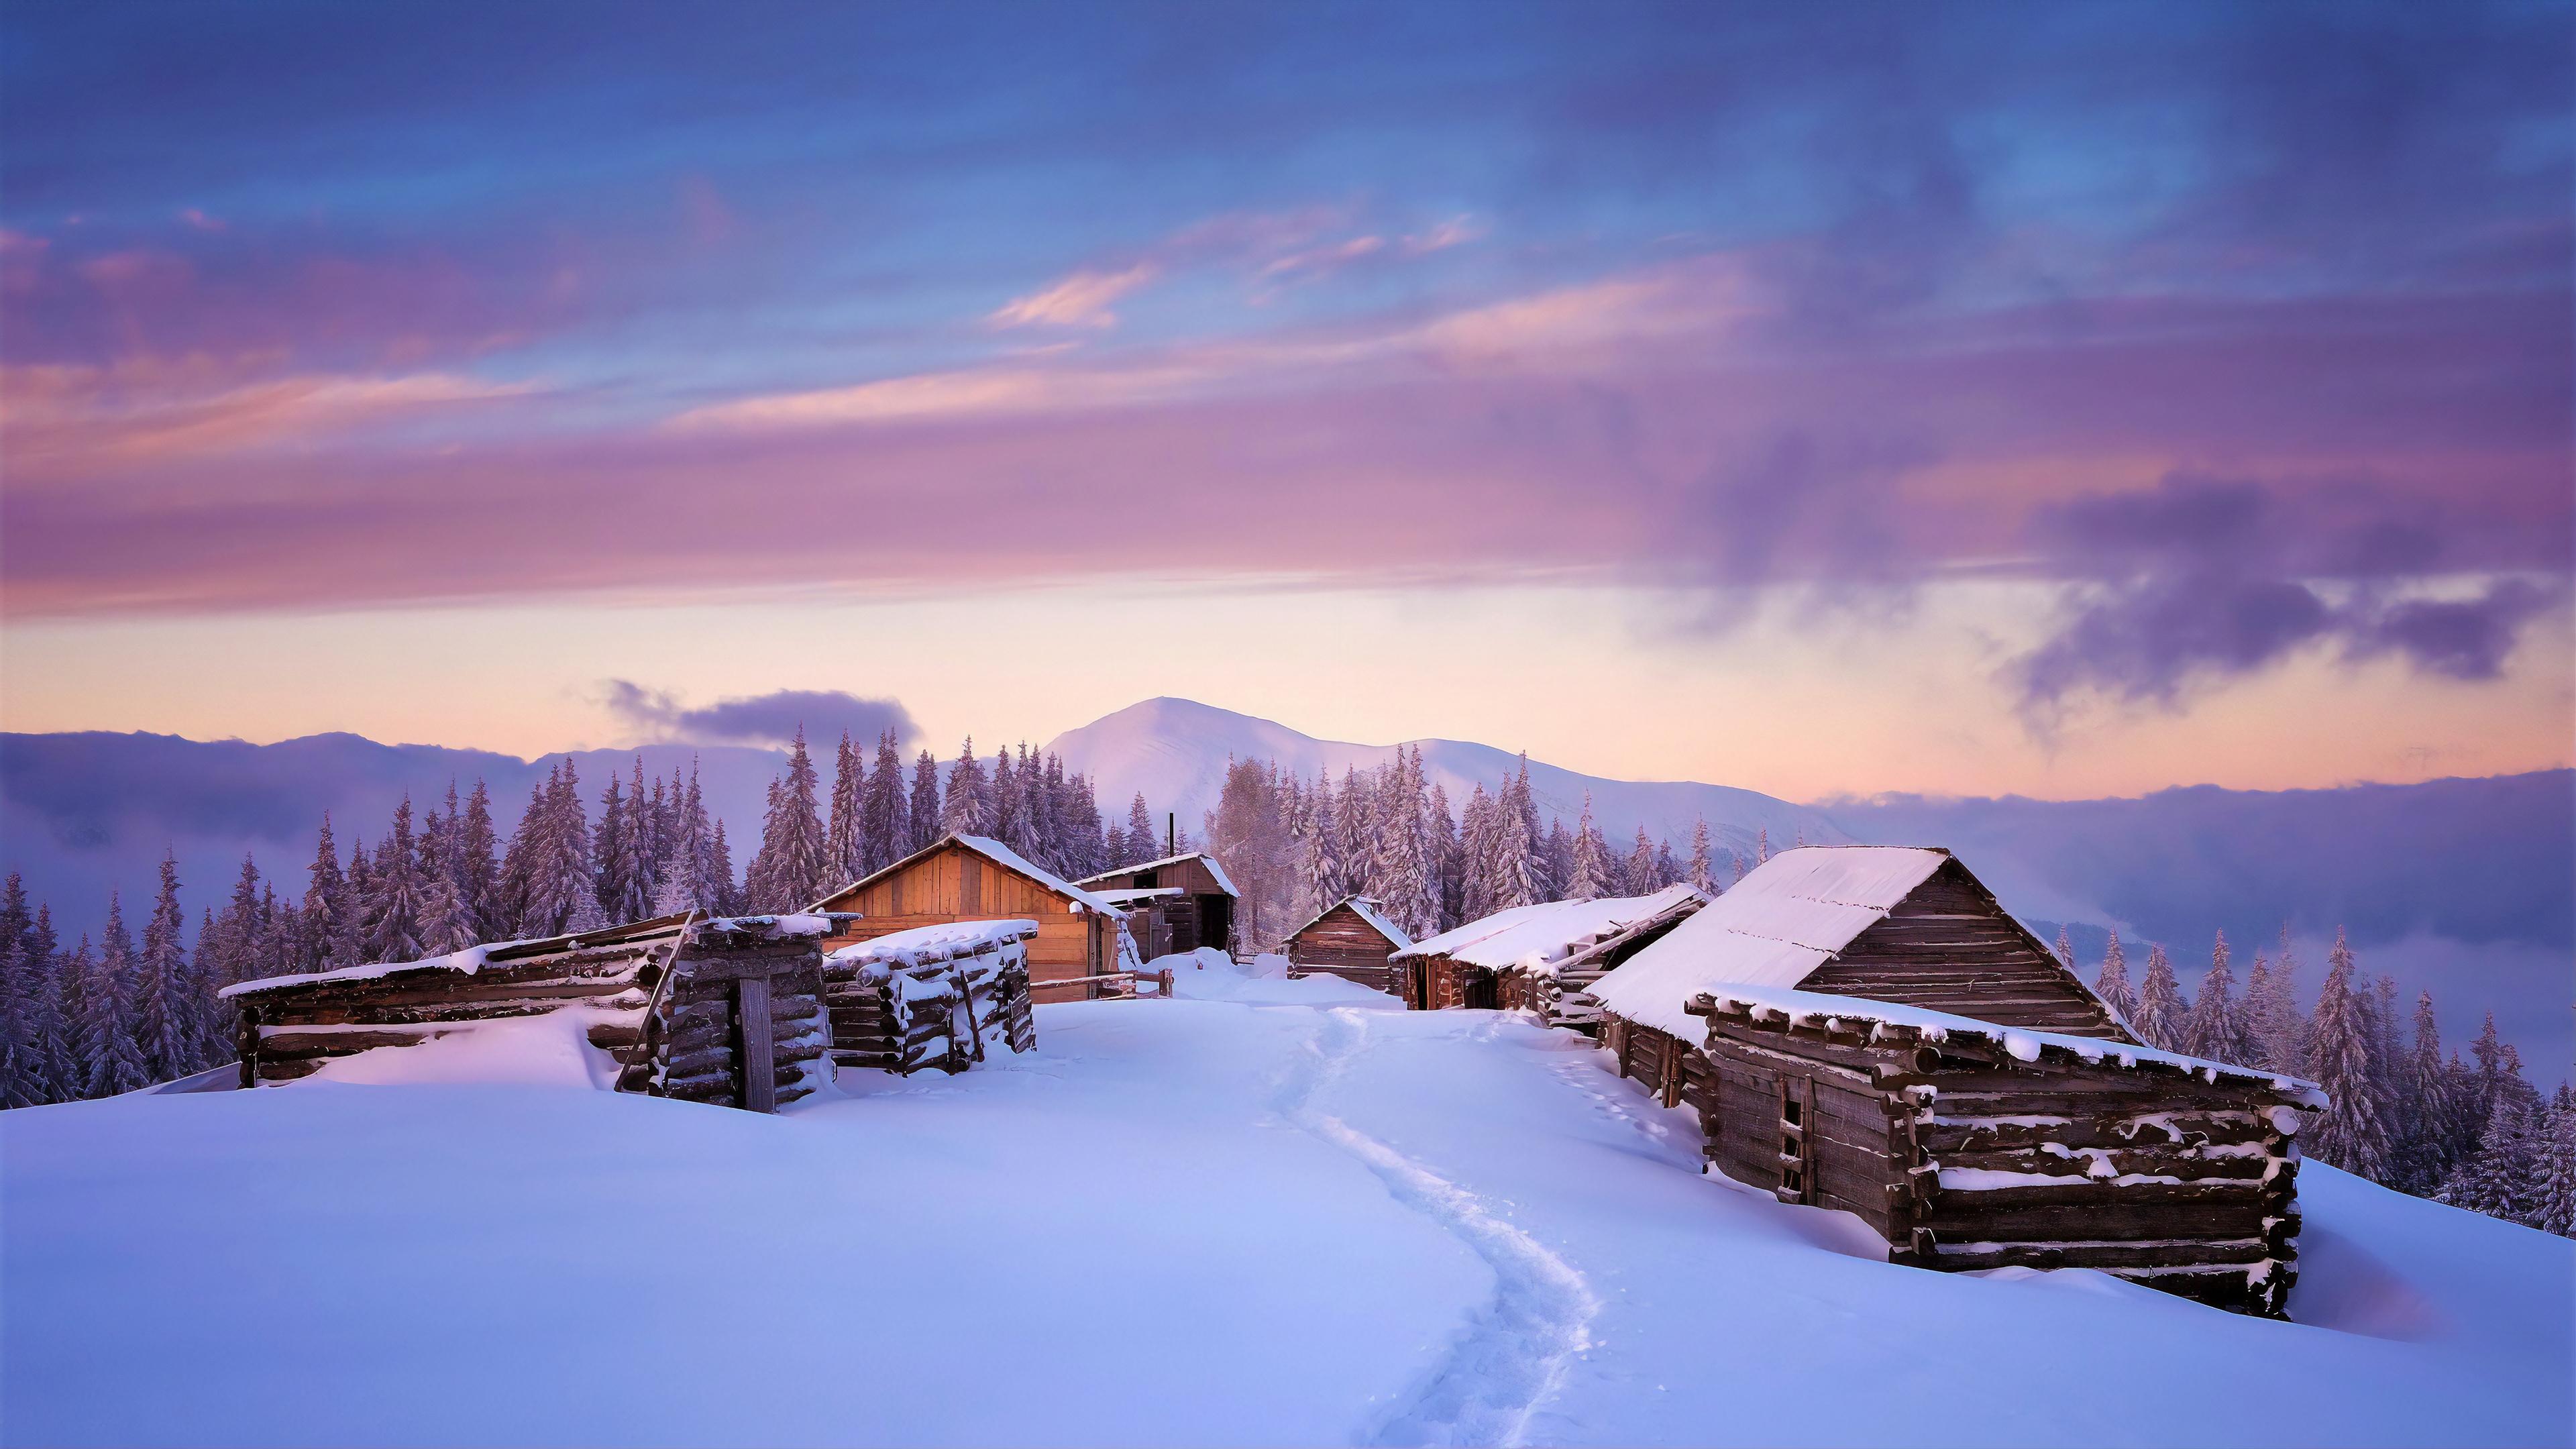 huts covered in snow 1574939532 - Huts Covered In Snow -